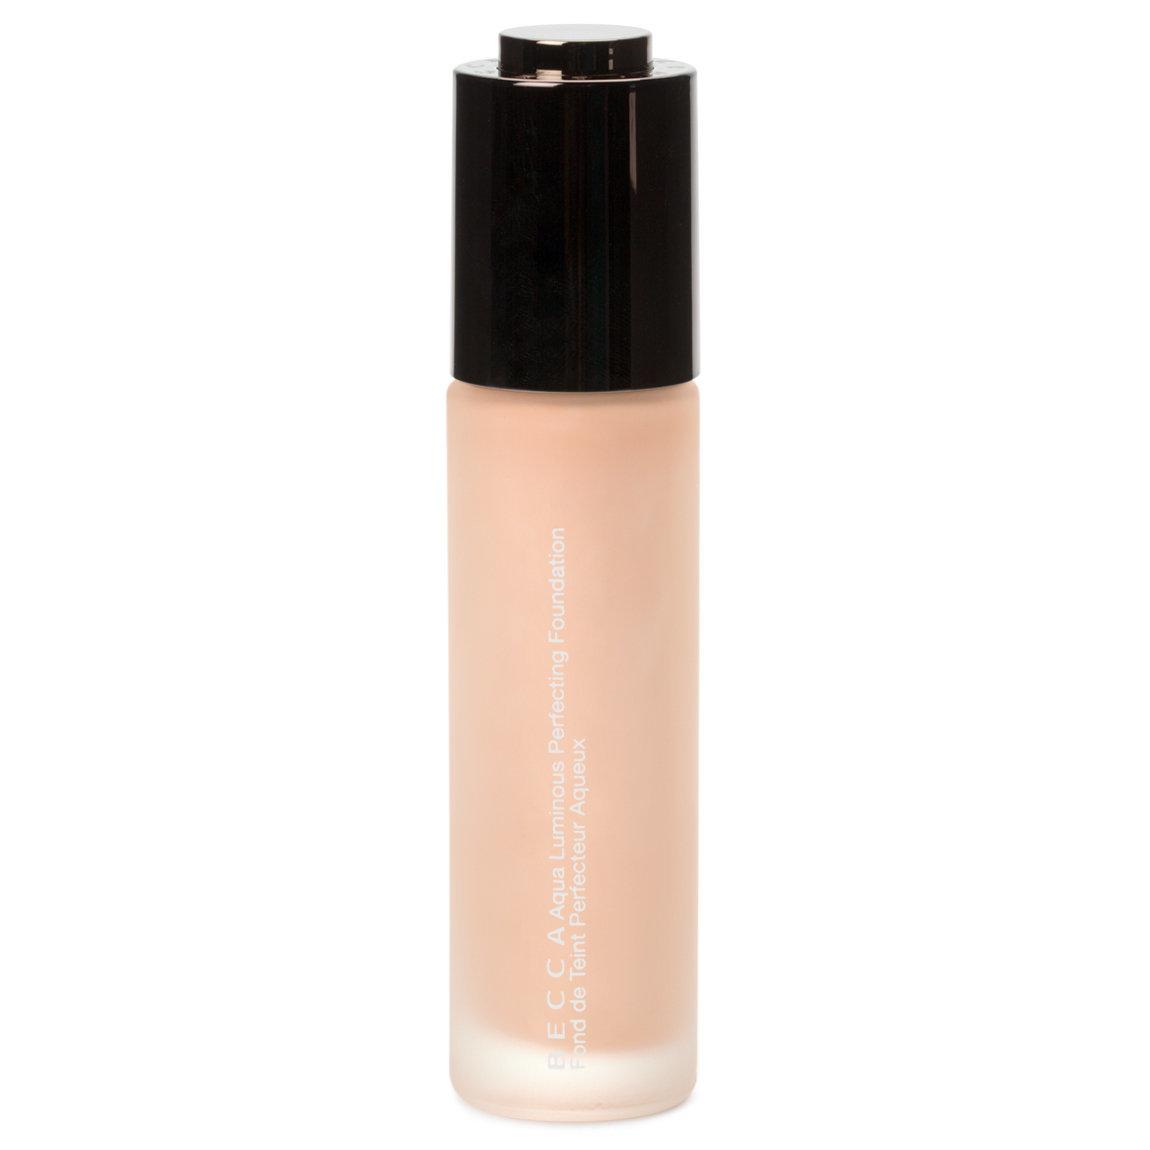 BECCA Cosmetics Aqua Luminous Perfecting Foundation Porcelain alternative view 1.